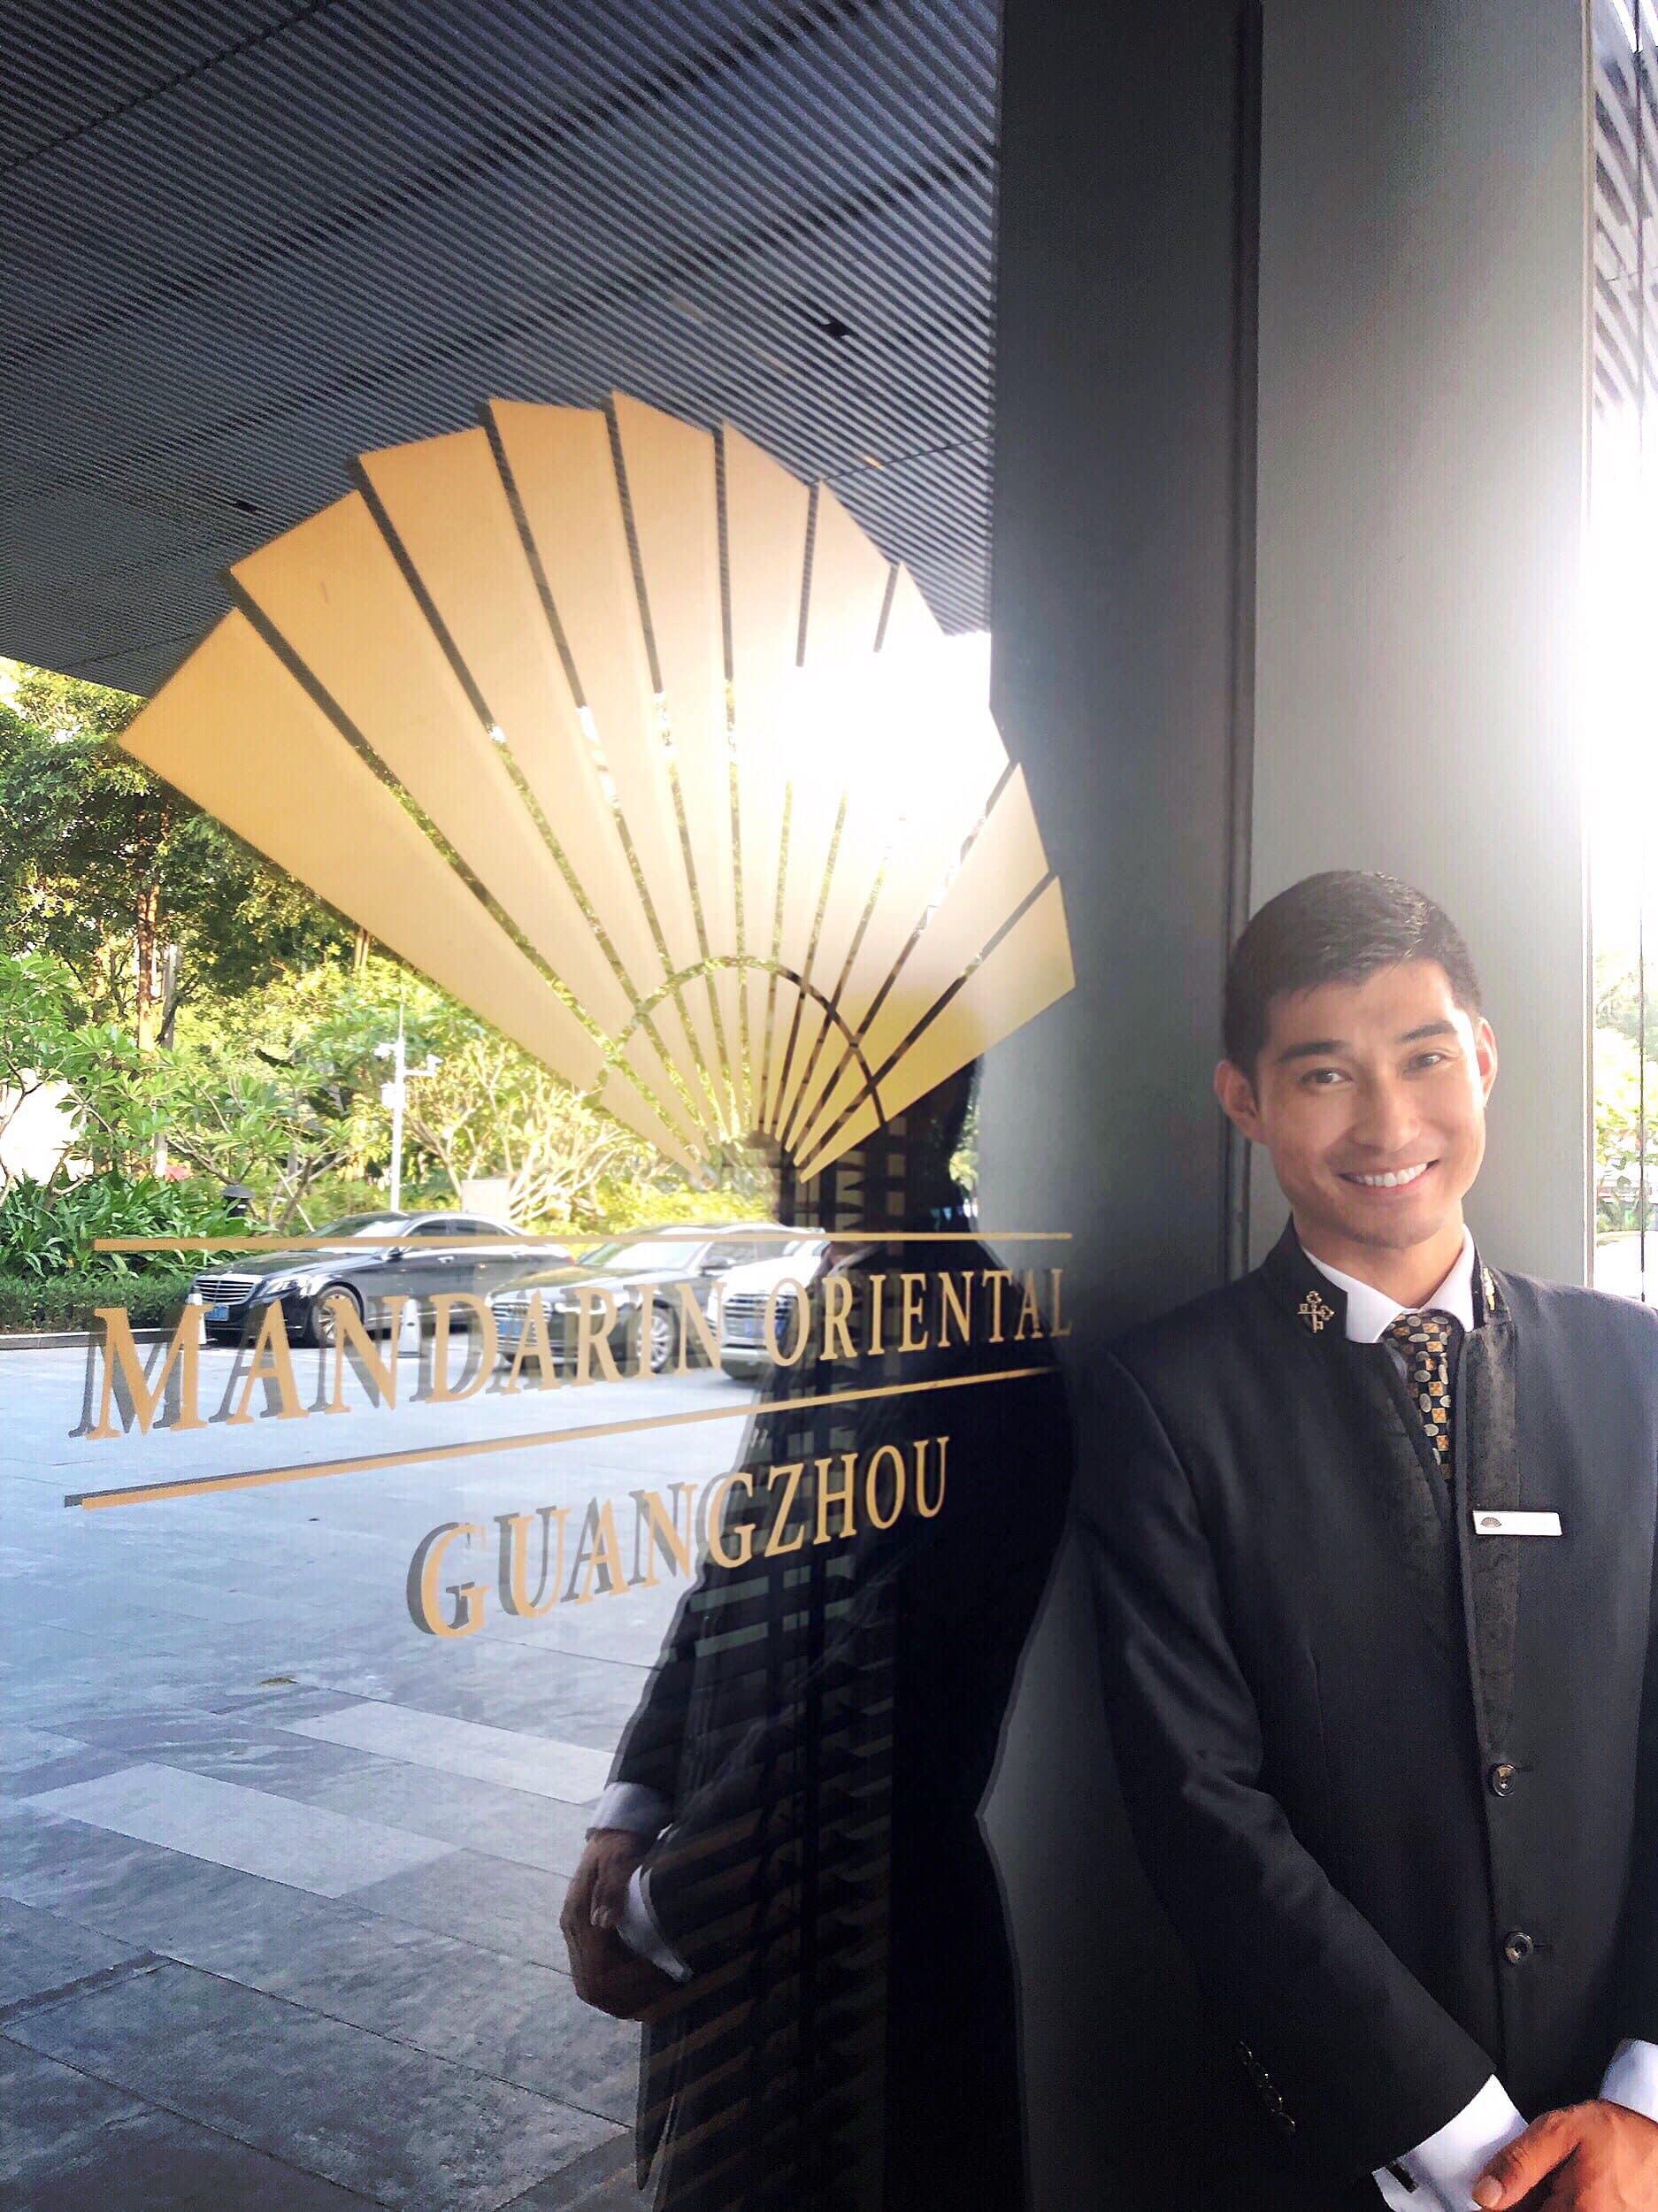 https://photos.mandarinoriental.com/is/image/MandarinOriental/dmo-mogzh-concierge